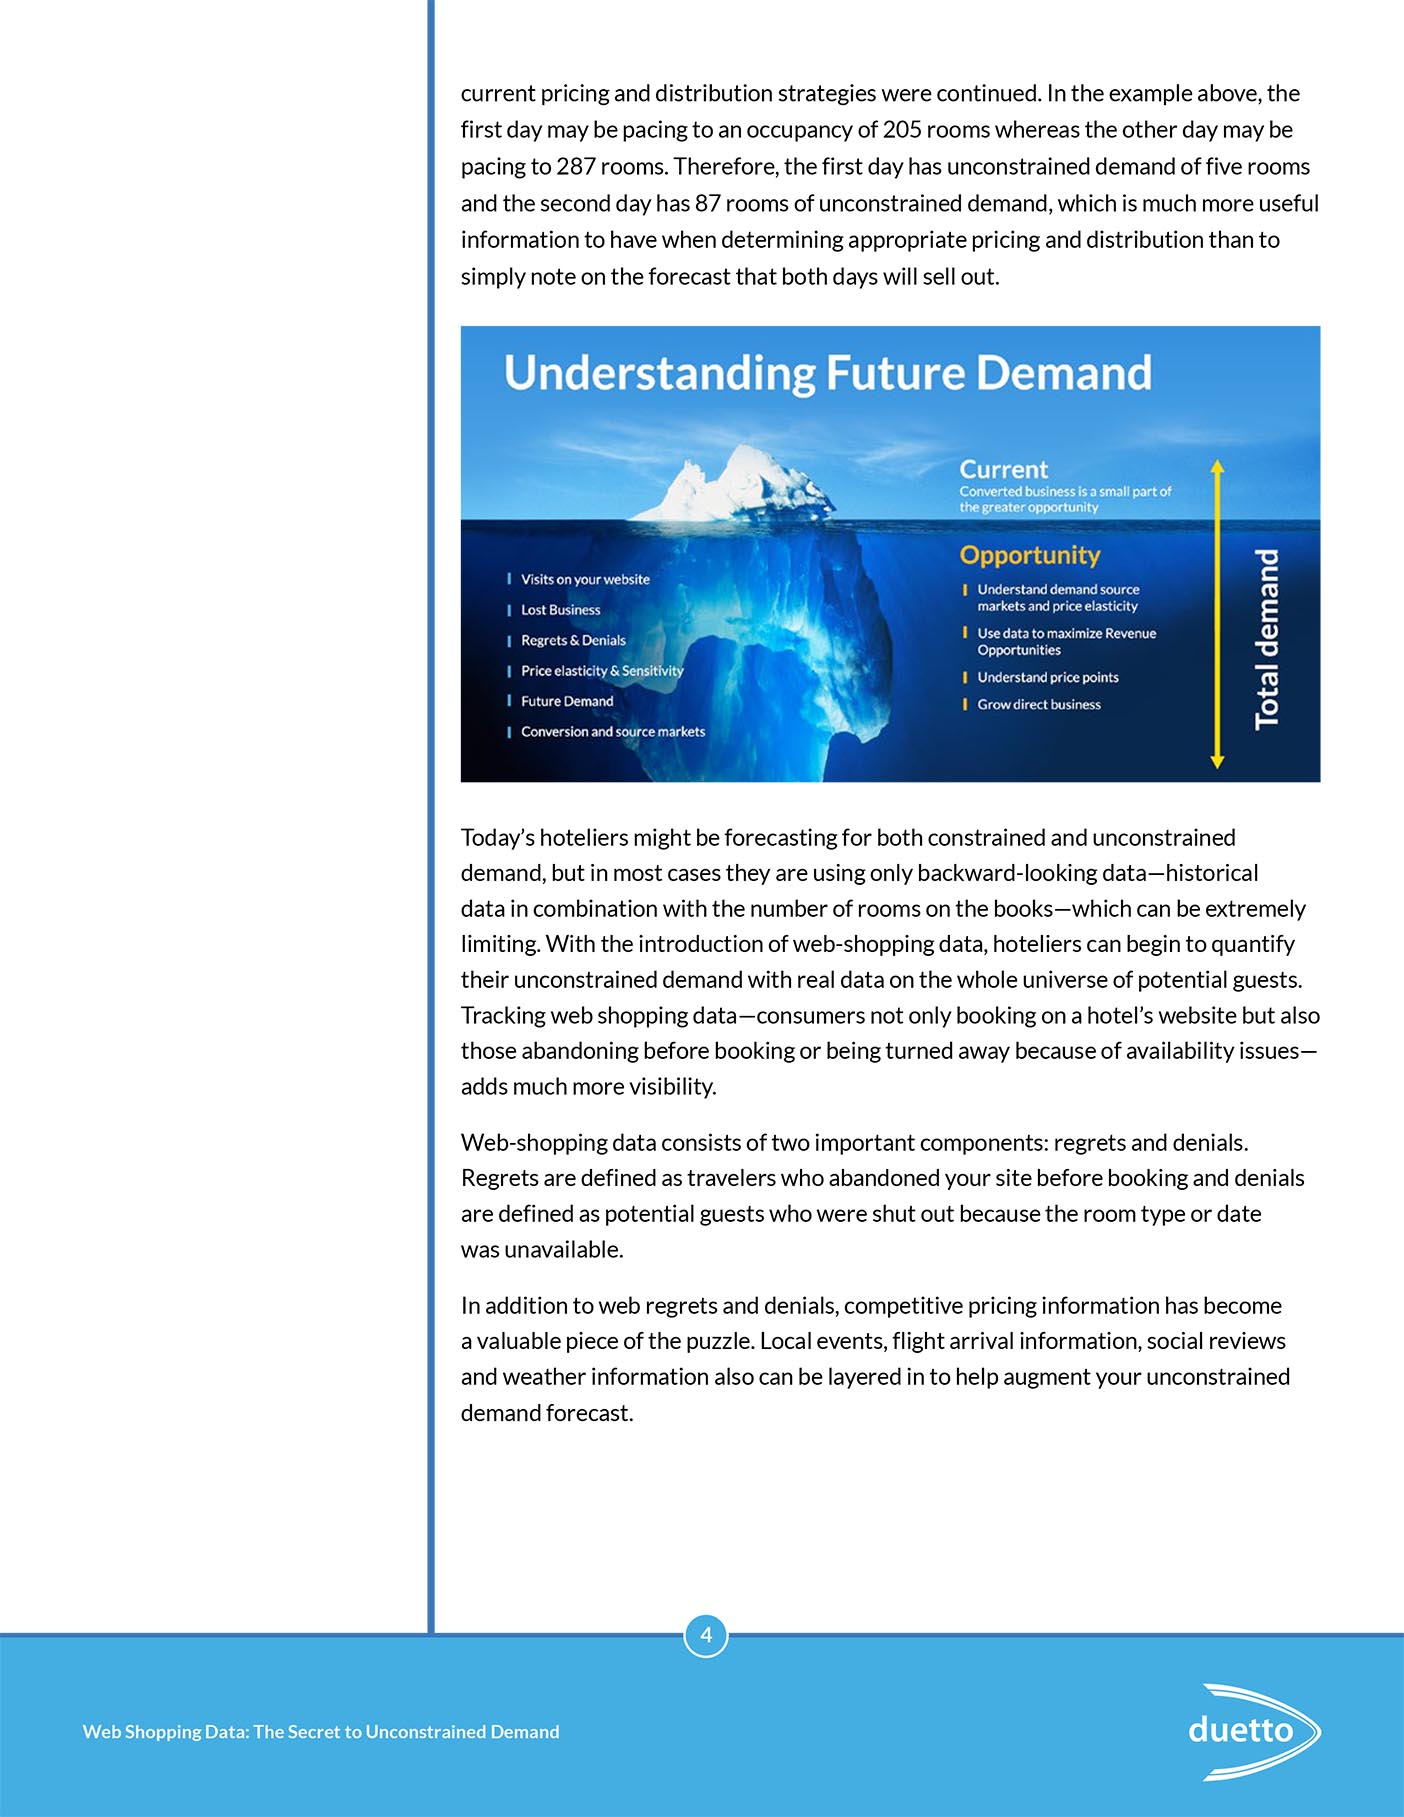 4 web-shopping-data-secret-to-unconstrained-demand-4.jpg